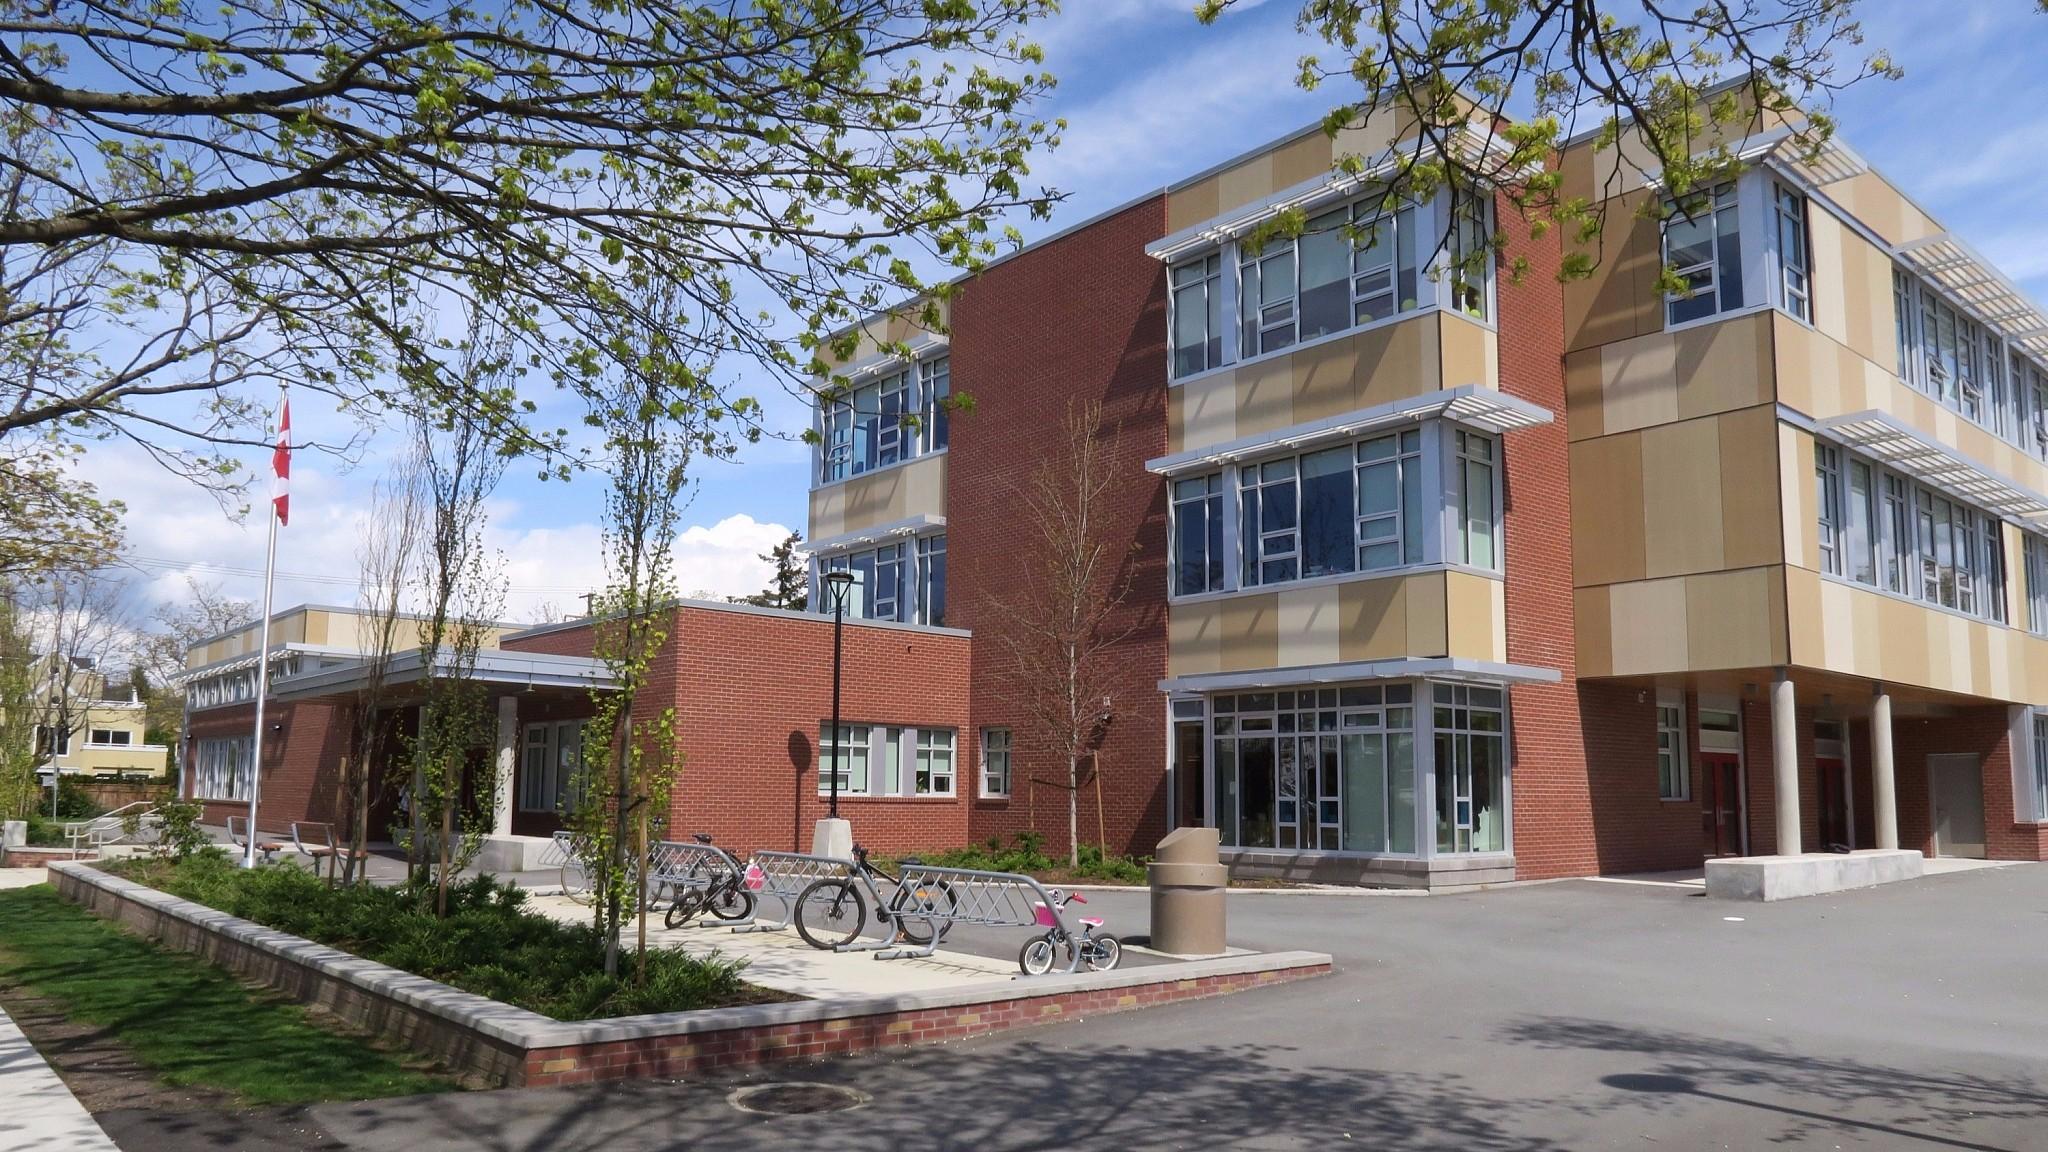 General Gordon Elementary School in Vancouver, Canada (Michael Sayachack via wikicommons)